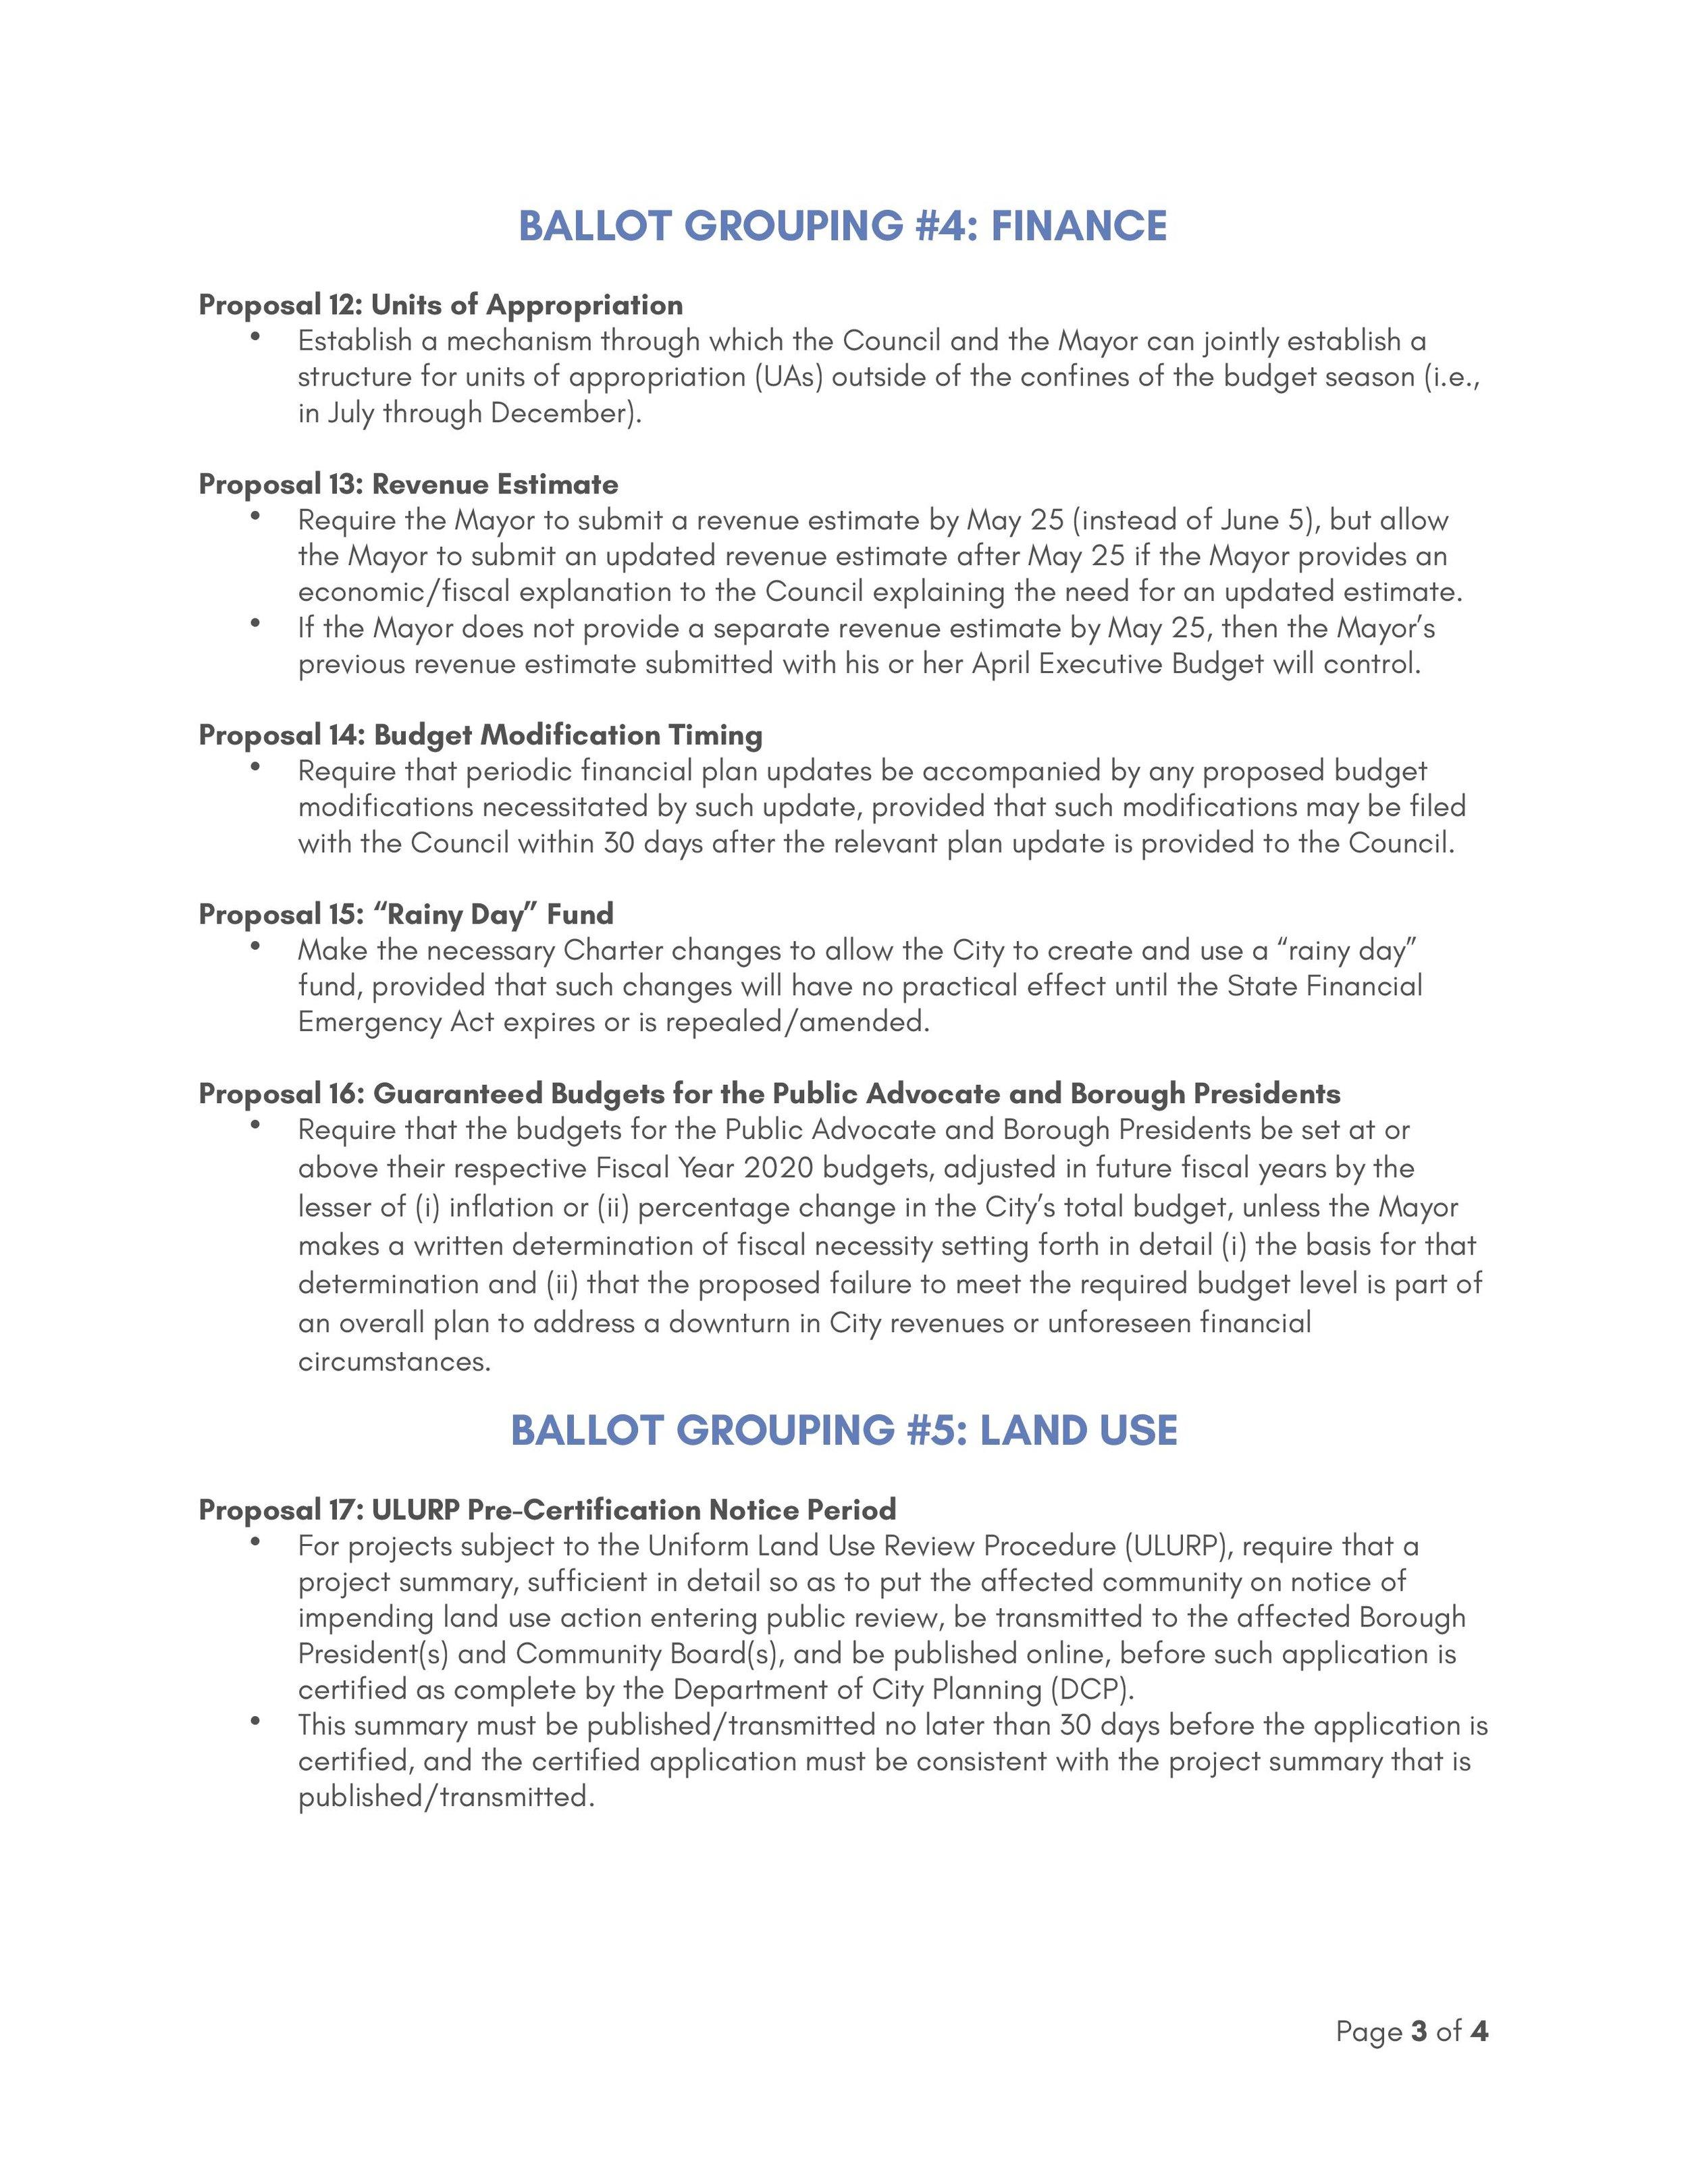 BallotProposals-page-003.jpg